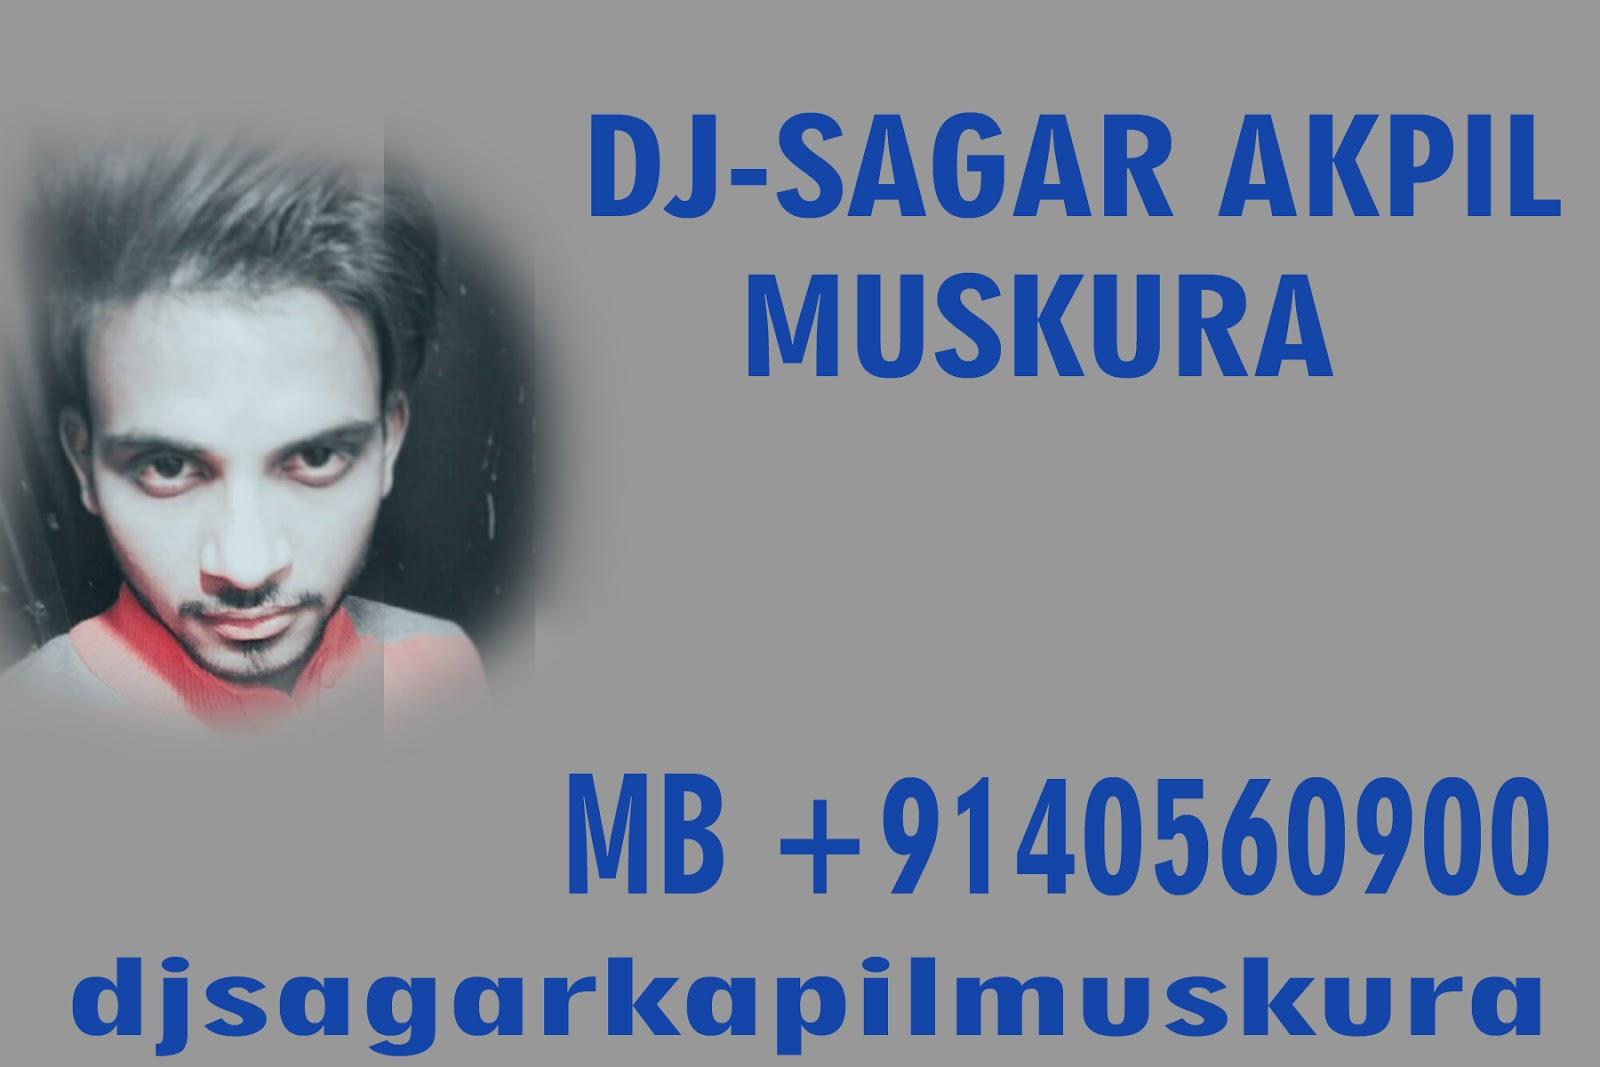 Dj CHOTU KHAJURAHO: DJ SAGAR KAPIL MUSKURA Full Collection